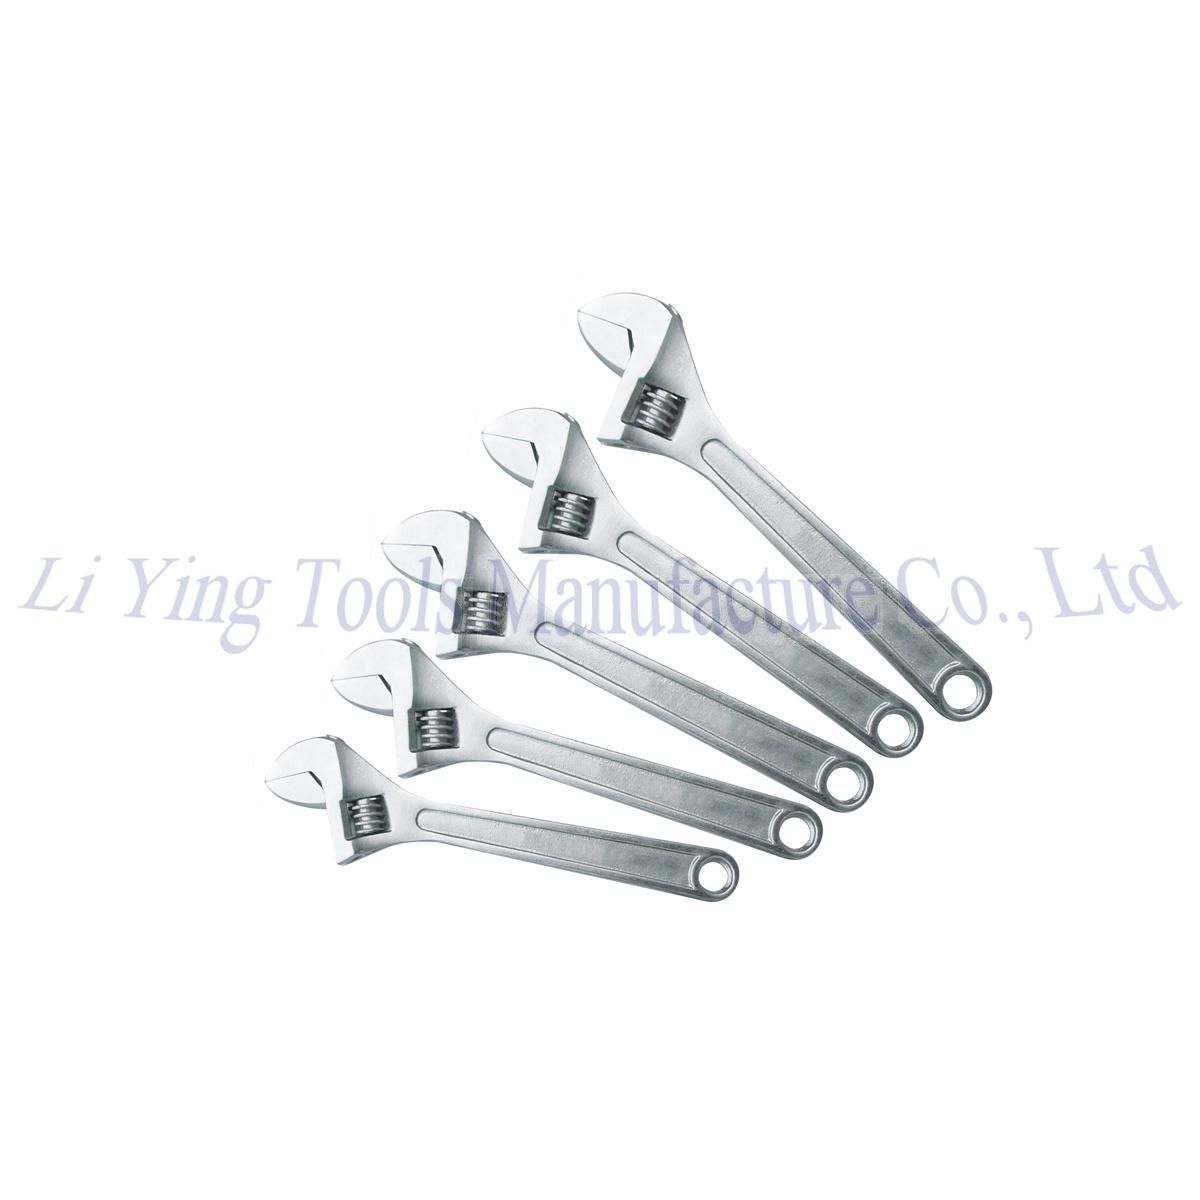 Adjustable wrench set - photo#8